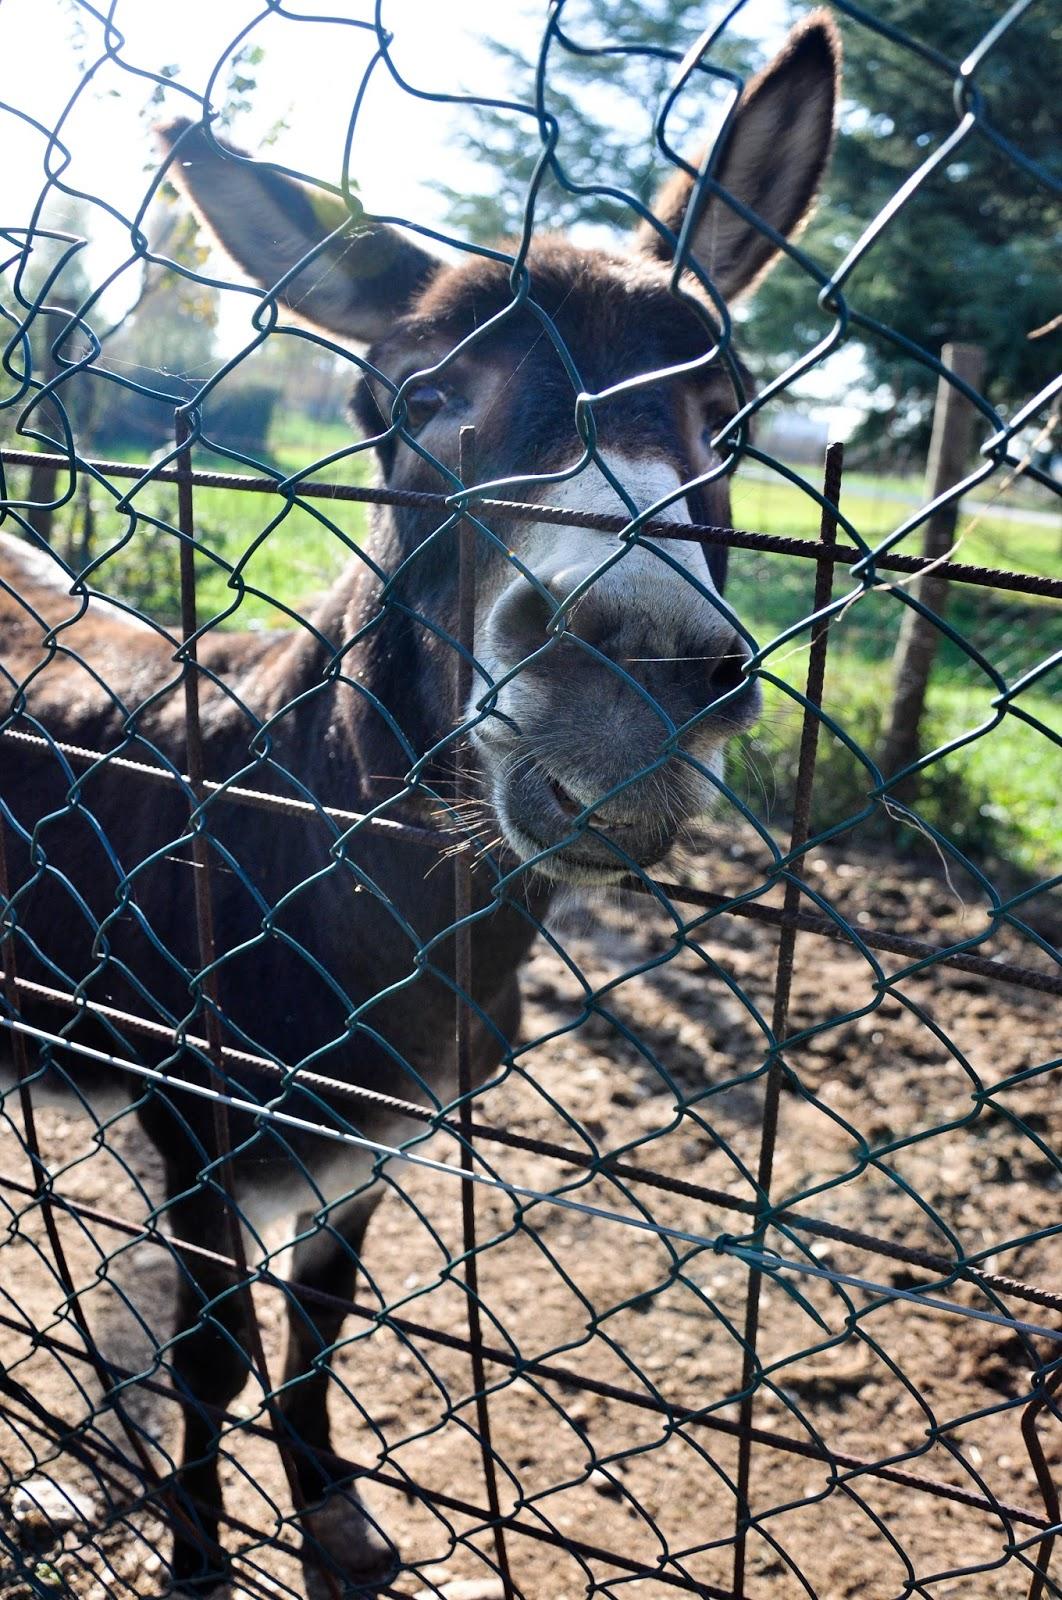 Donkey, Agriturismo La Borina, Veneto, Italy